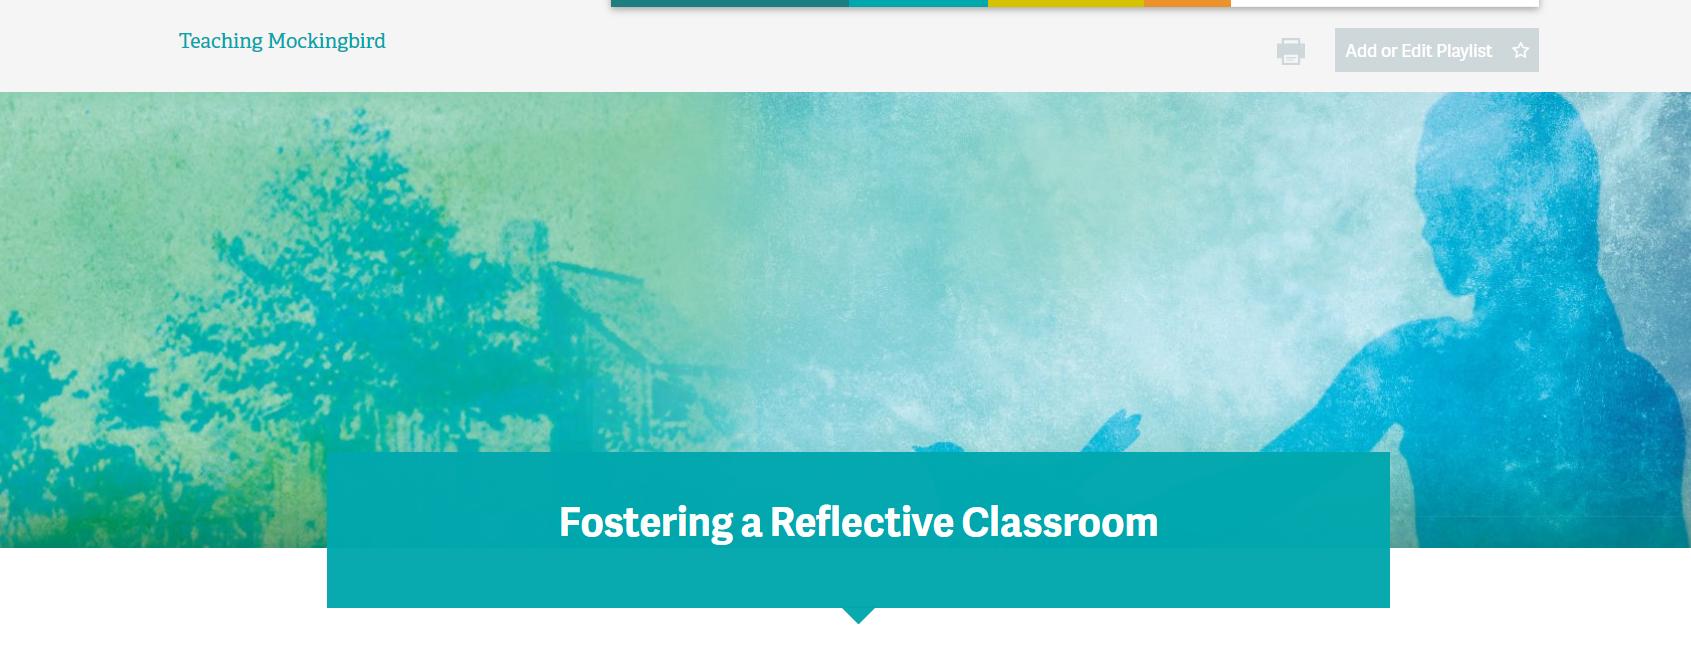 Reflective Classroom Environments